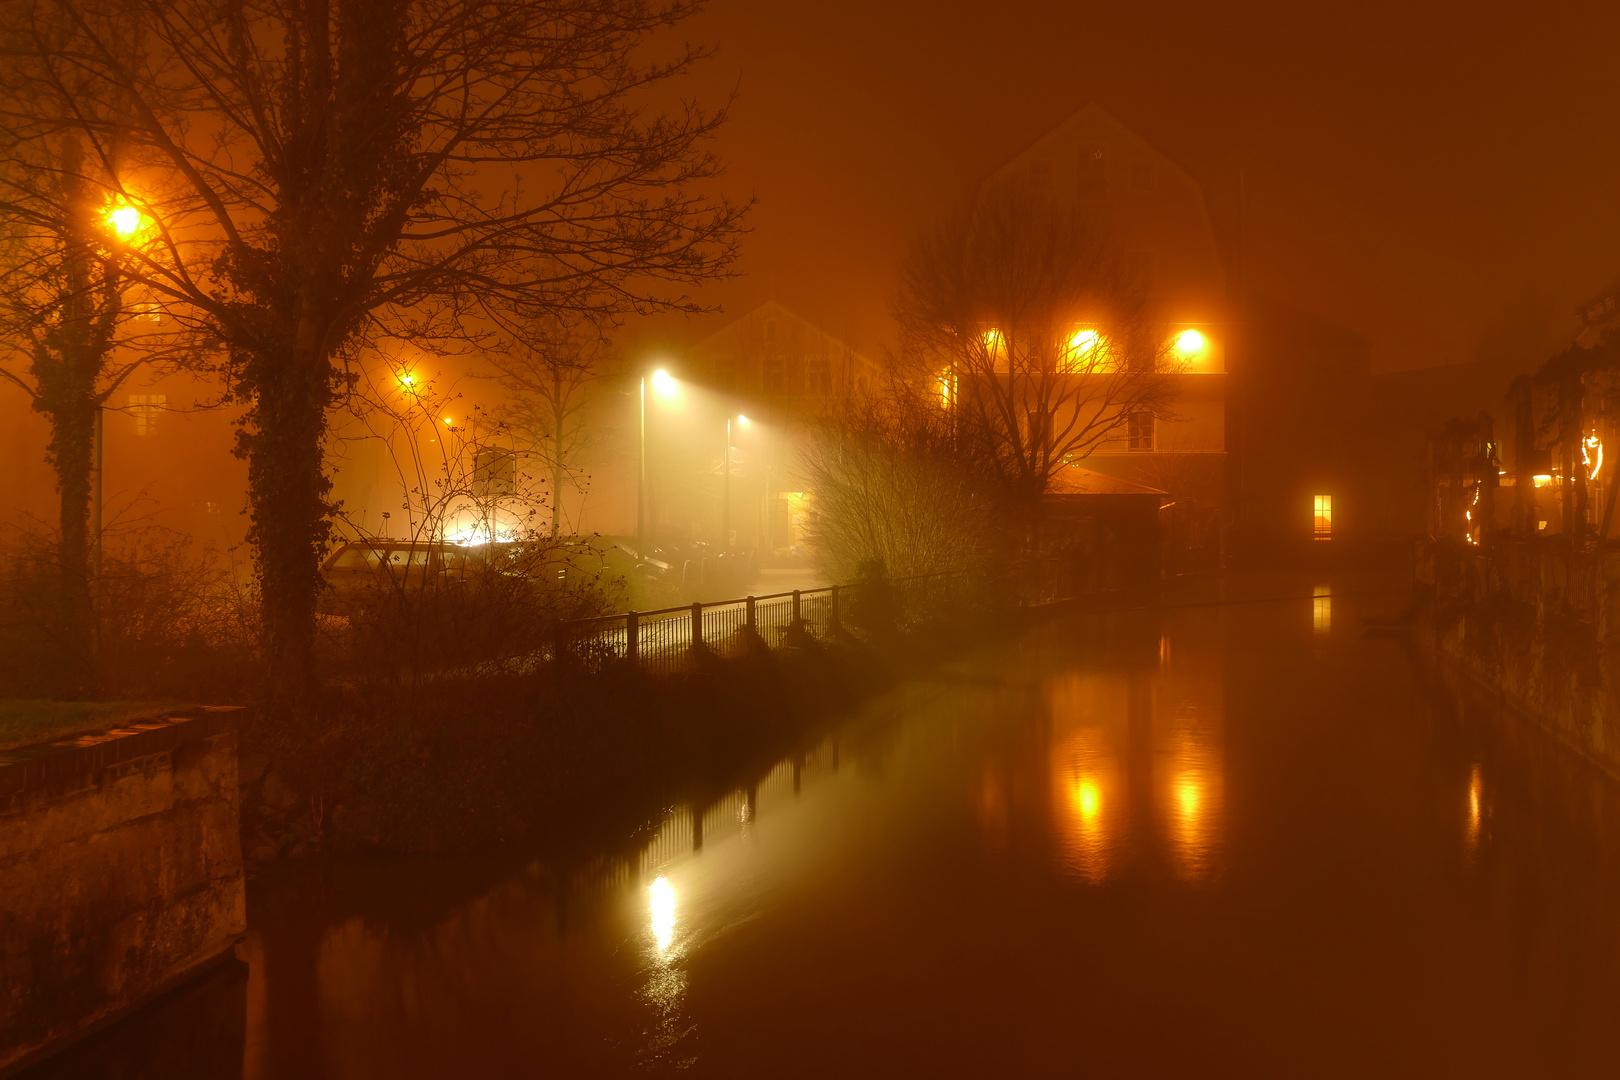 Erding im Nebel